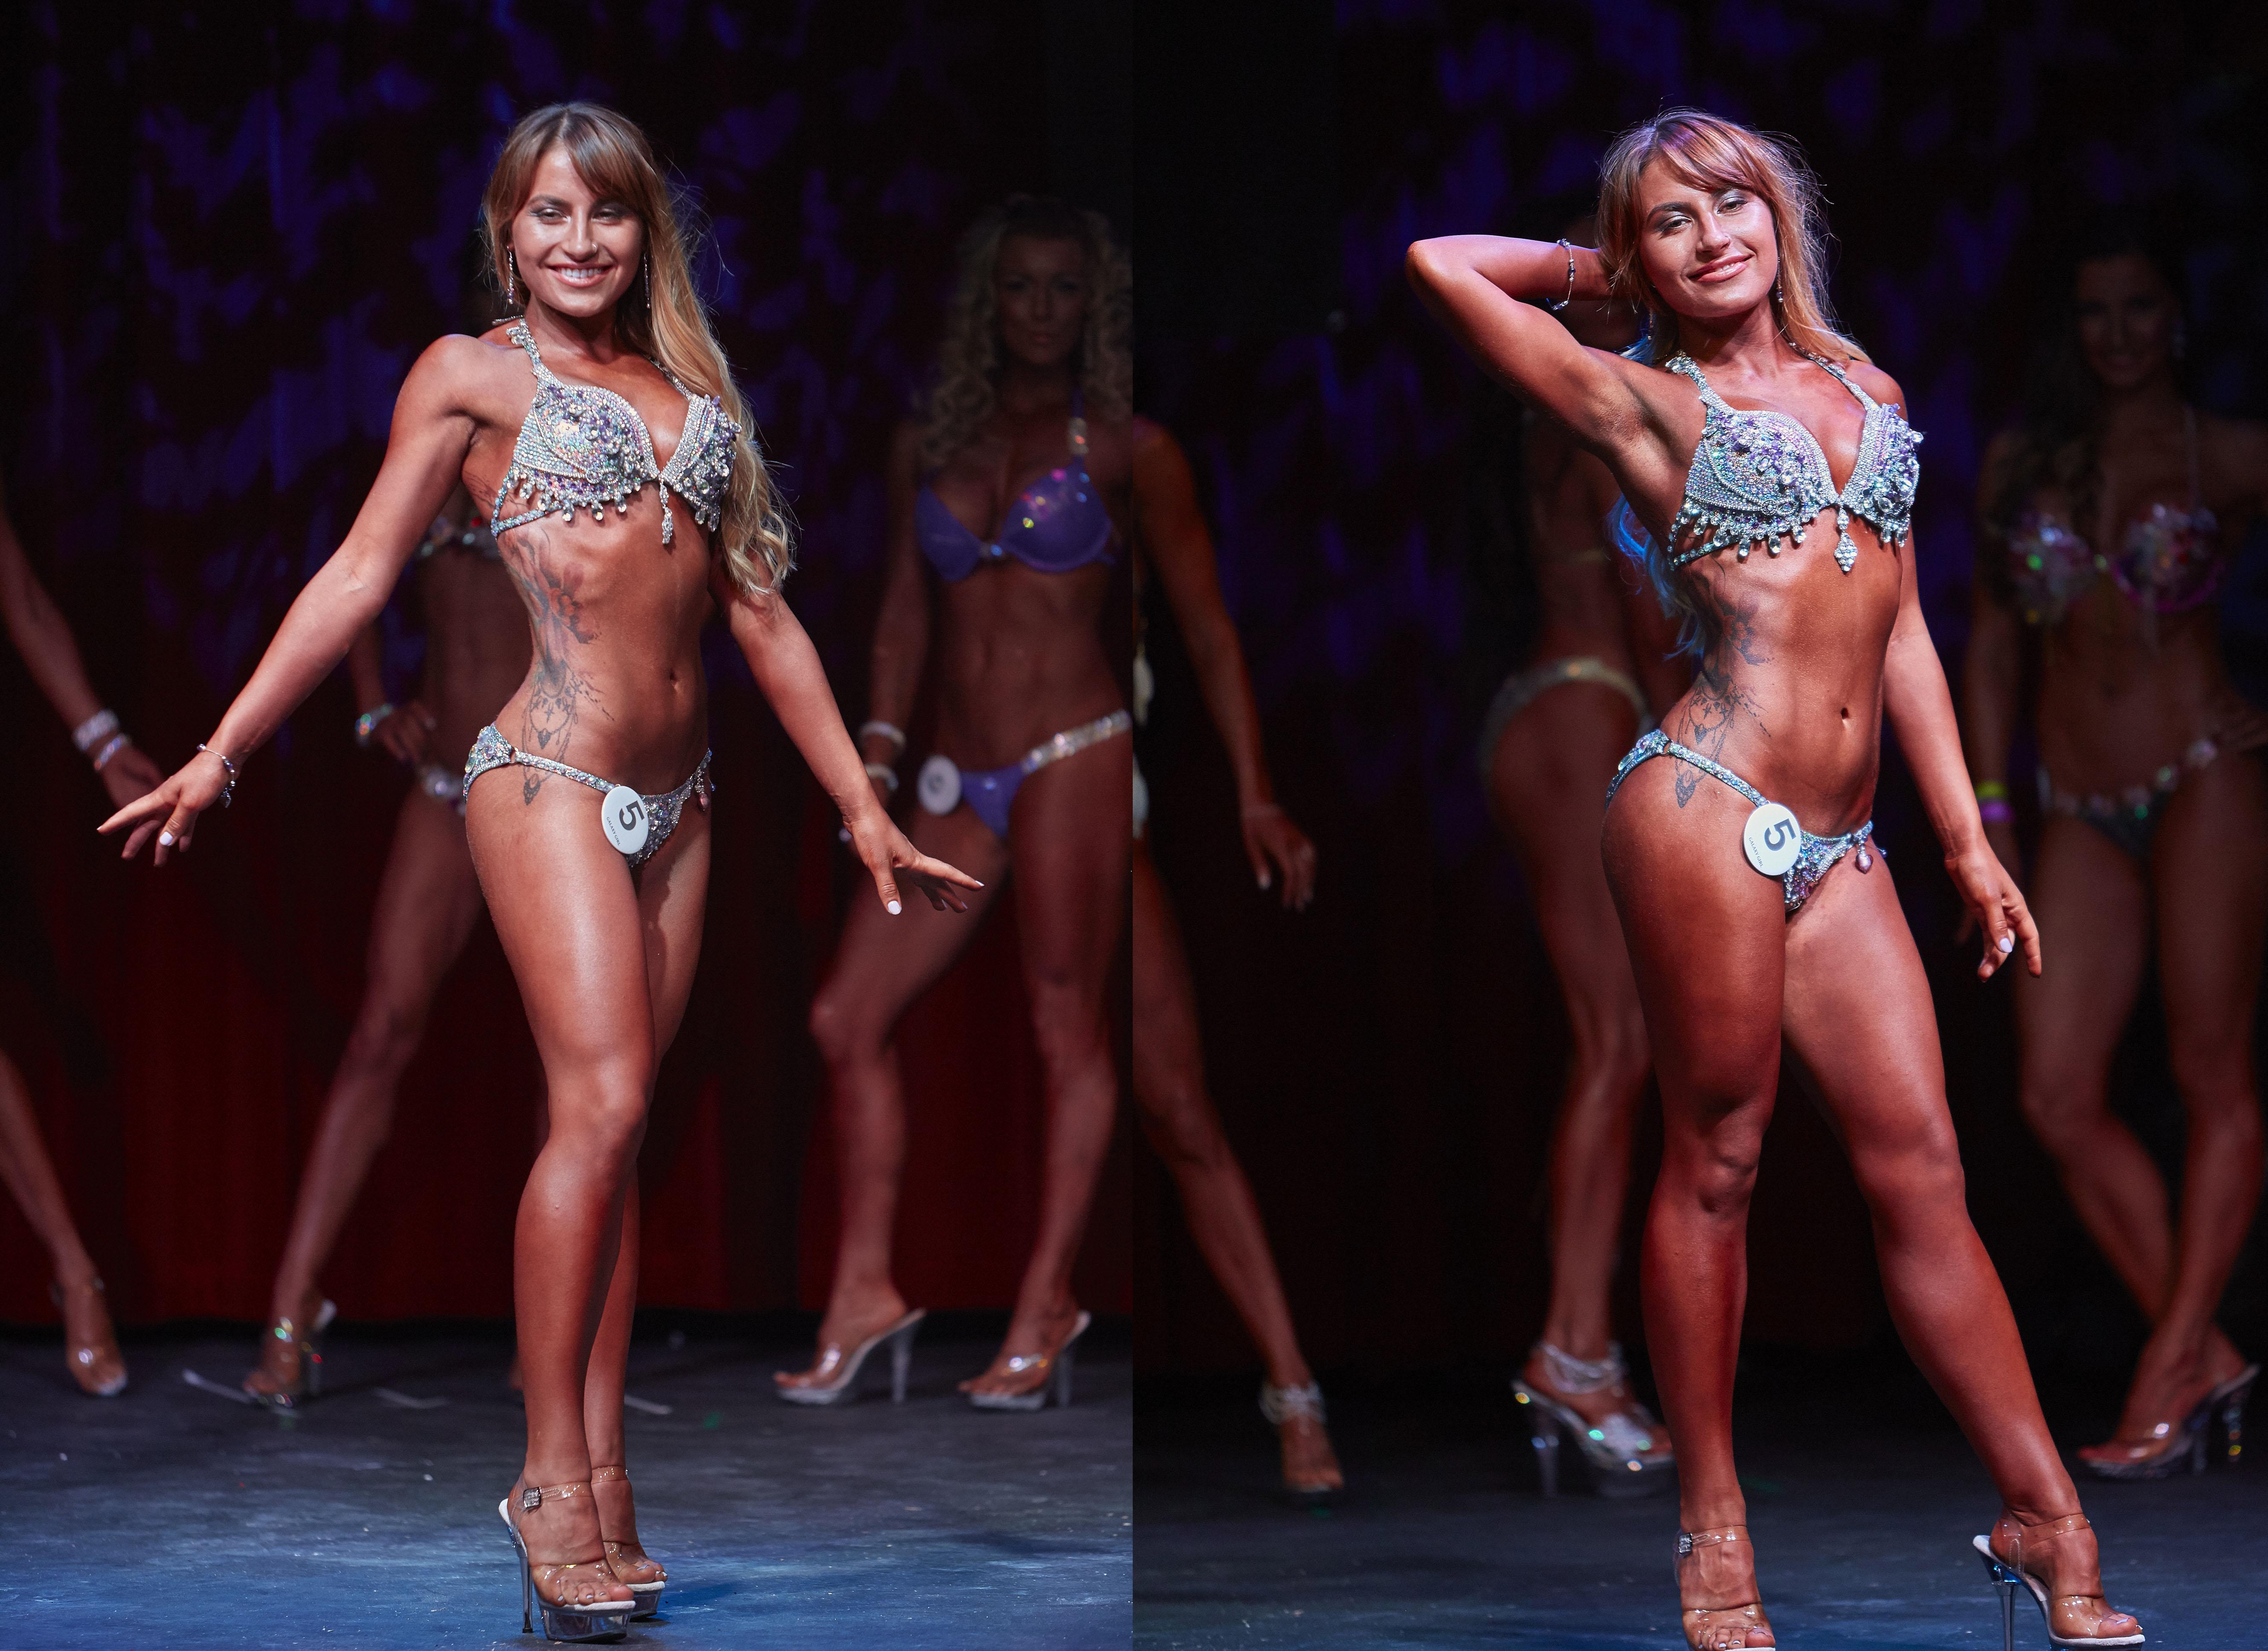 Deni Kirkova bikini fitness model competitor bodybuilding